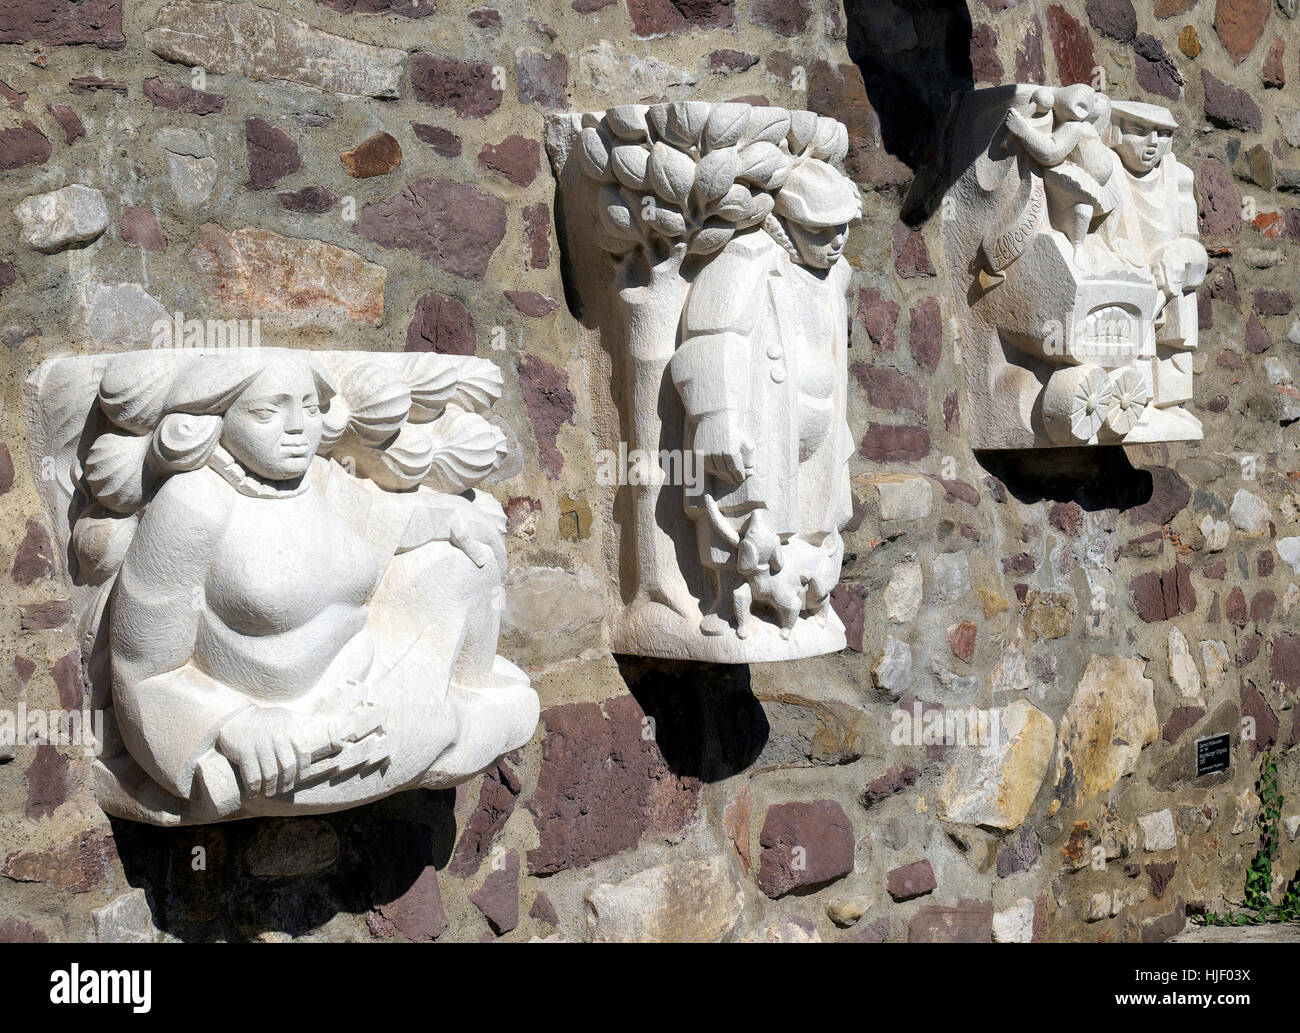 Magdeburg originals on city wall, sculptor Eberhard Roßdeutscher, Magdeburg, Saxony-Anhalt, Germany Stock Photo